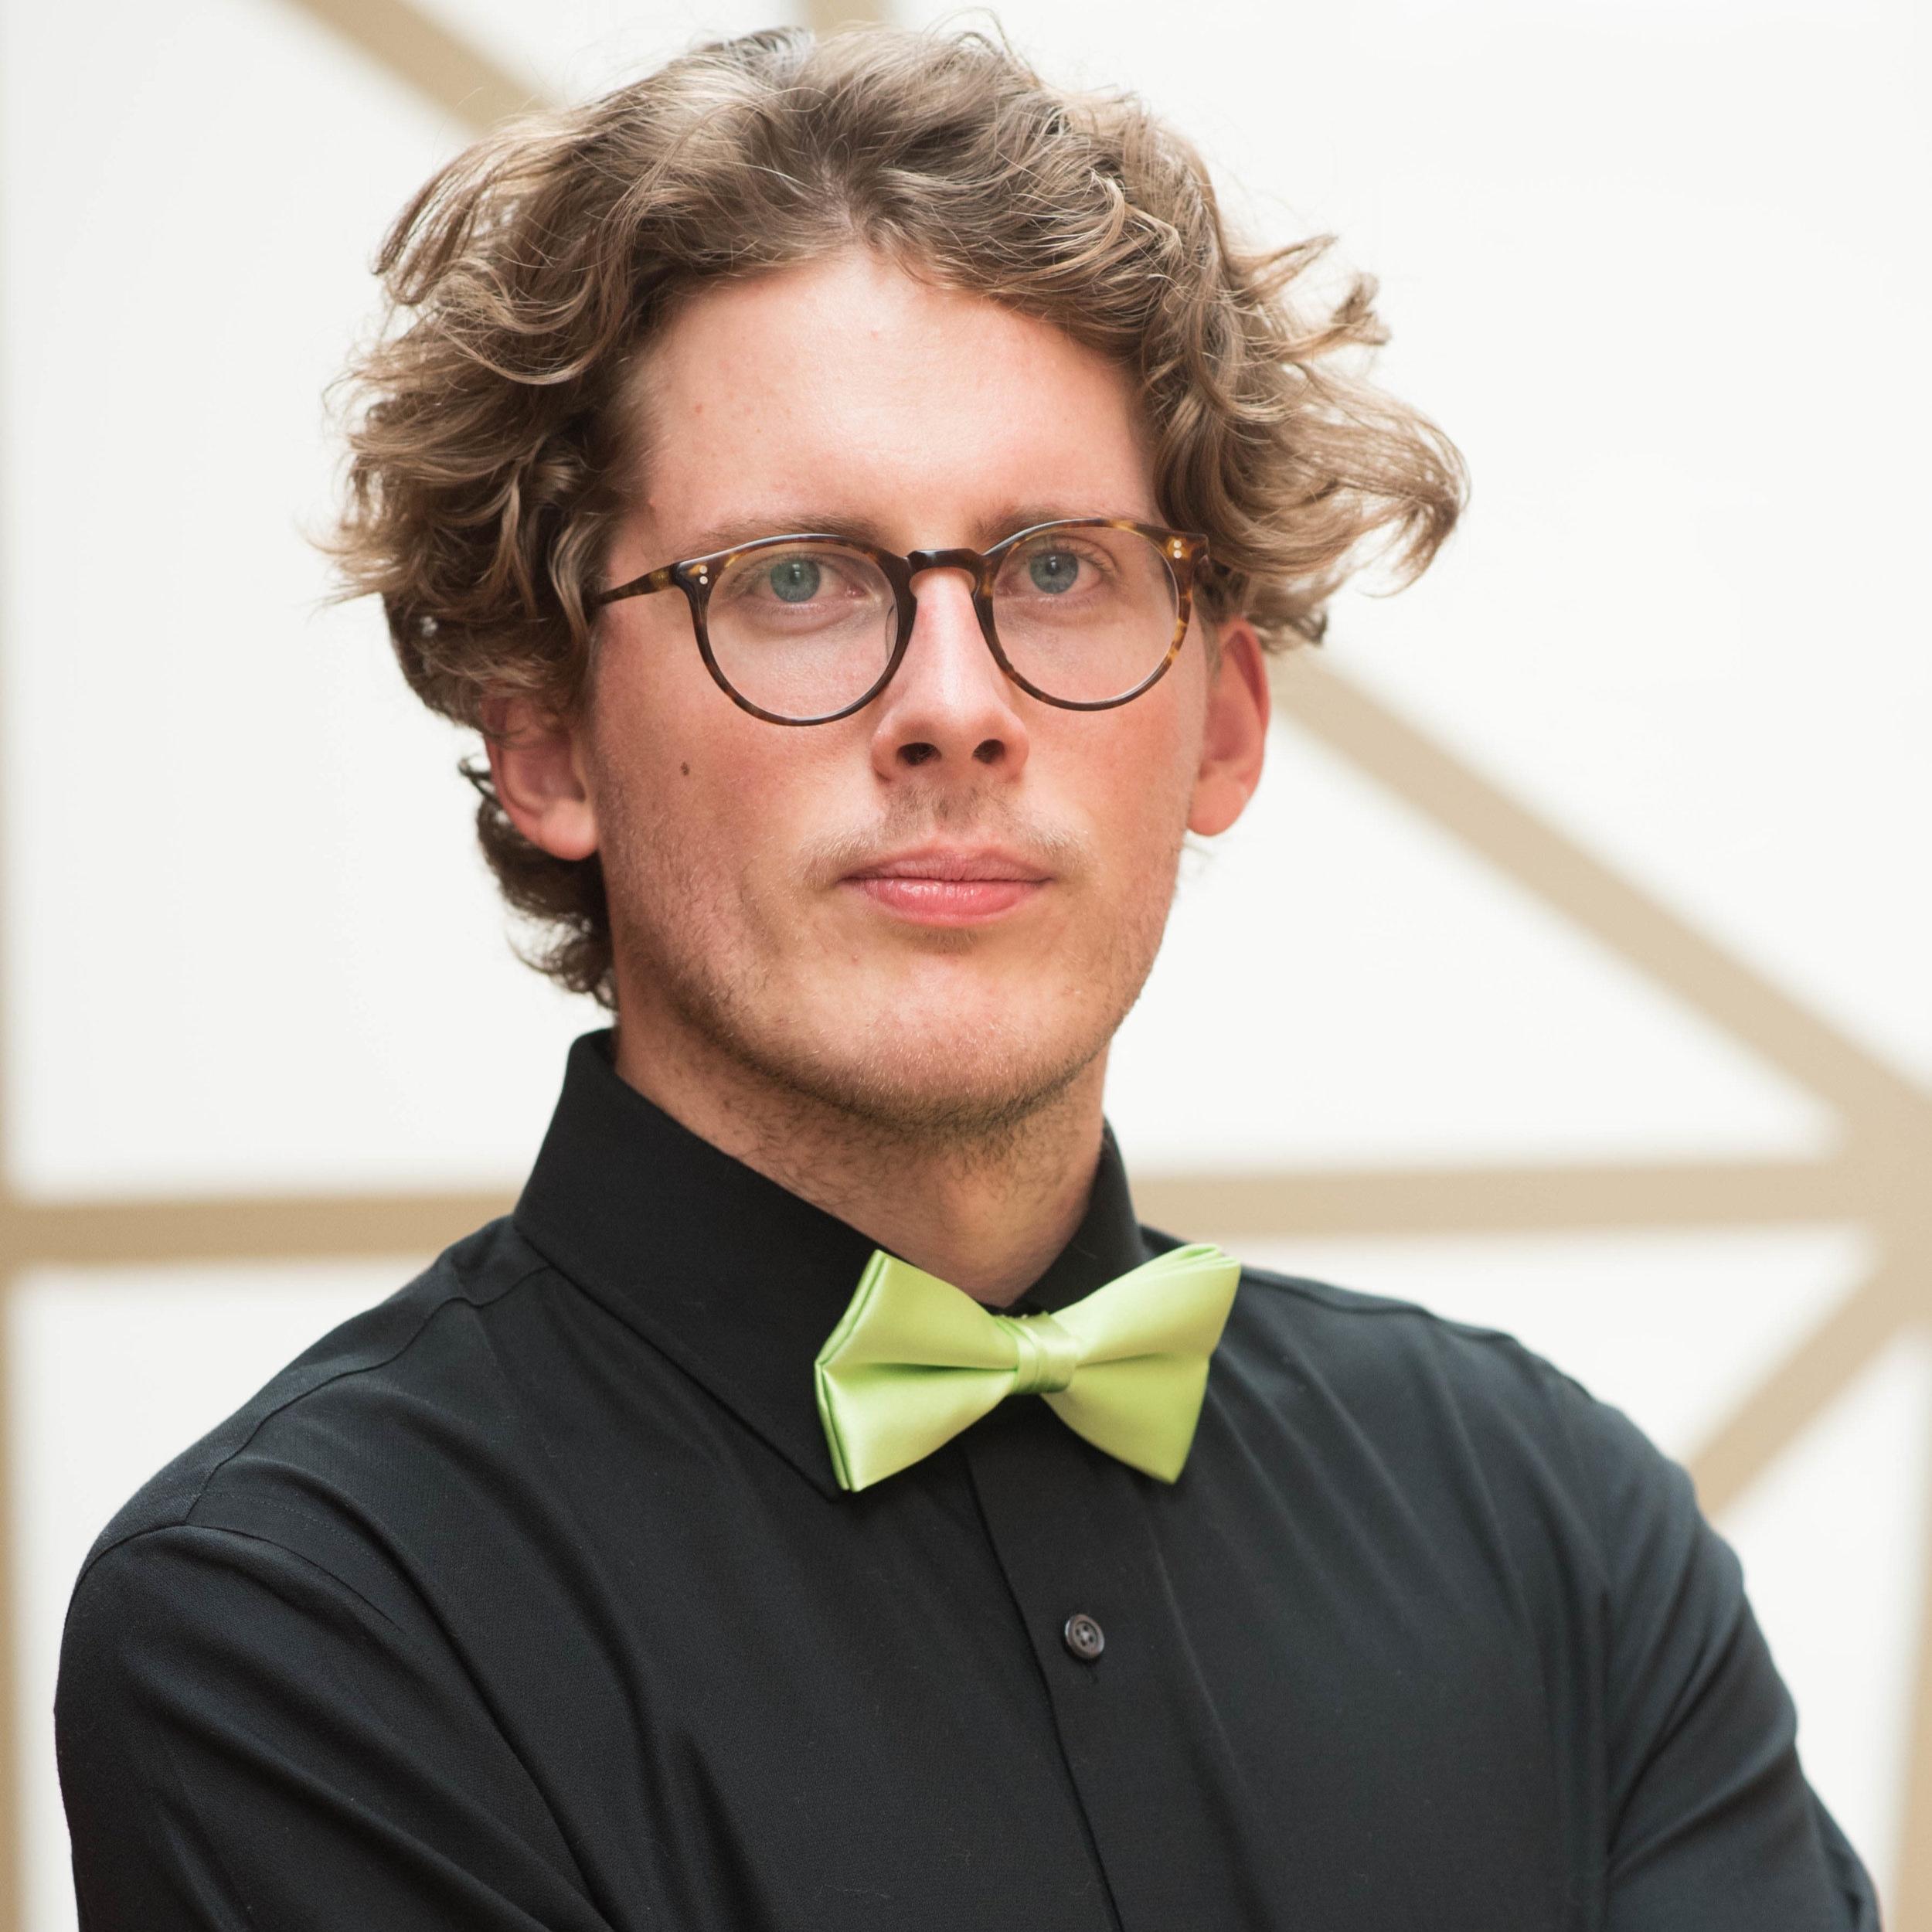 Oscar Micaelsson - PIANIST